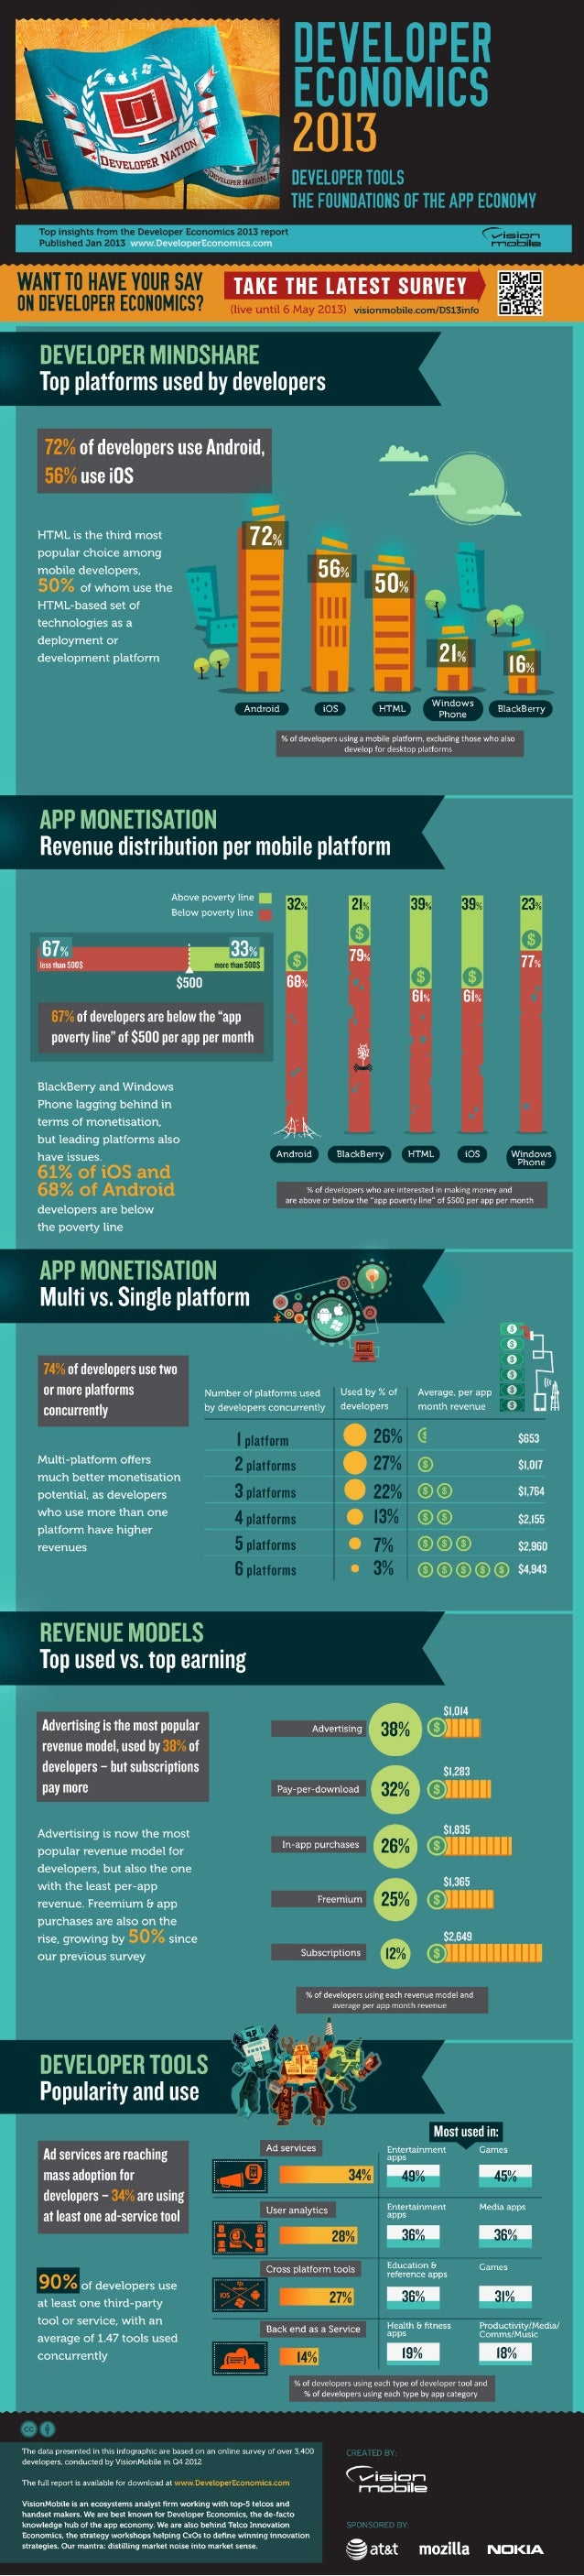 Developer economics q1 2013 infographic